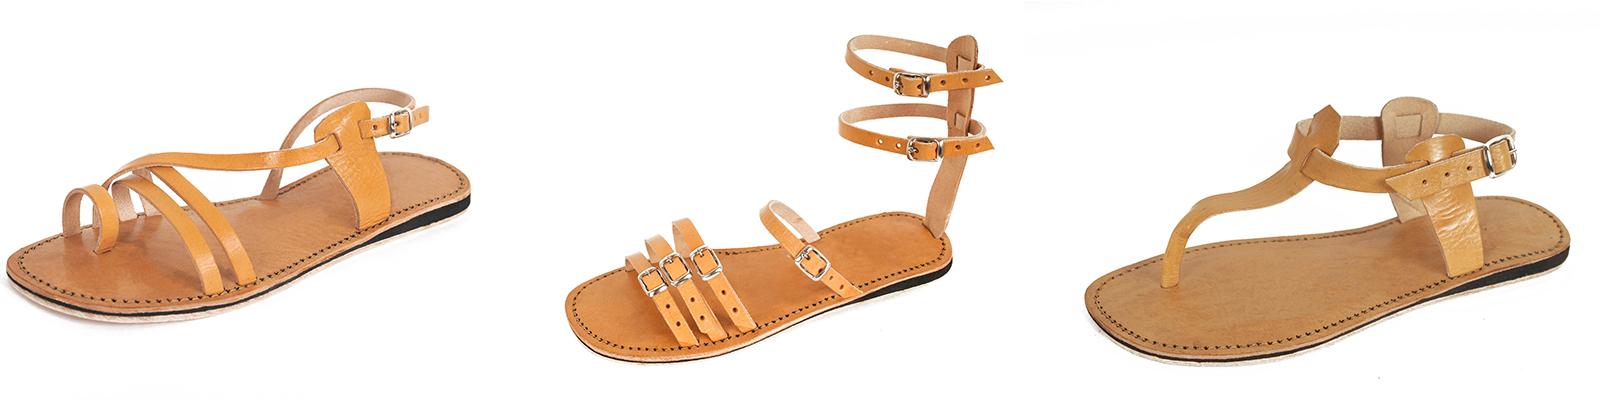 Trio sandales femmes